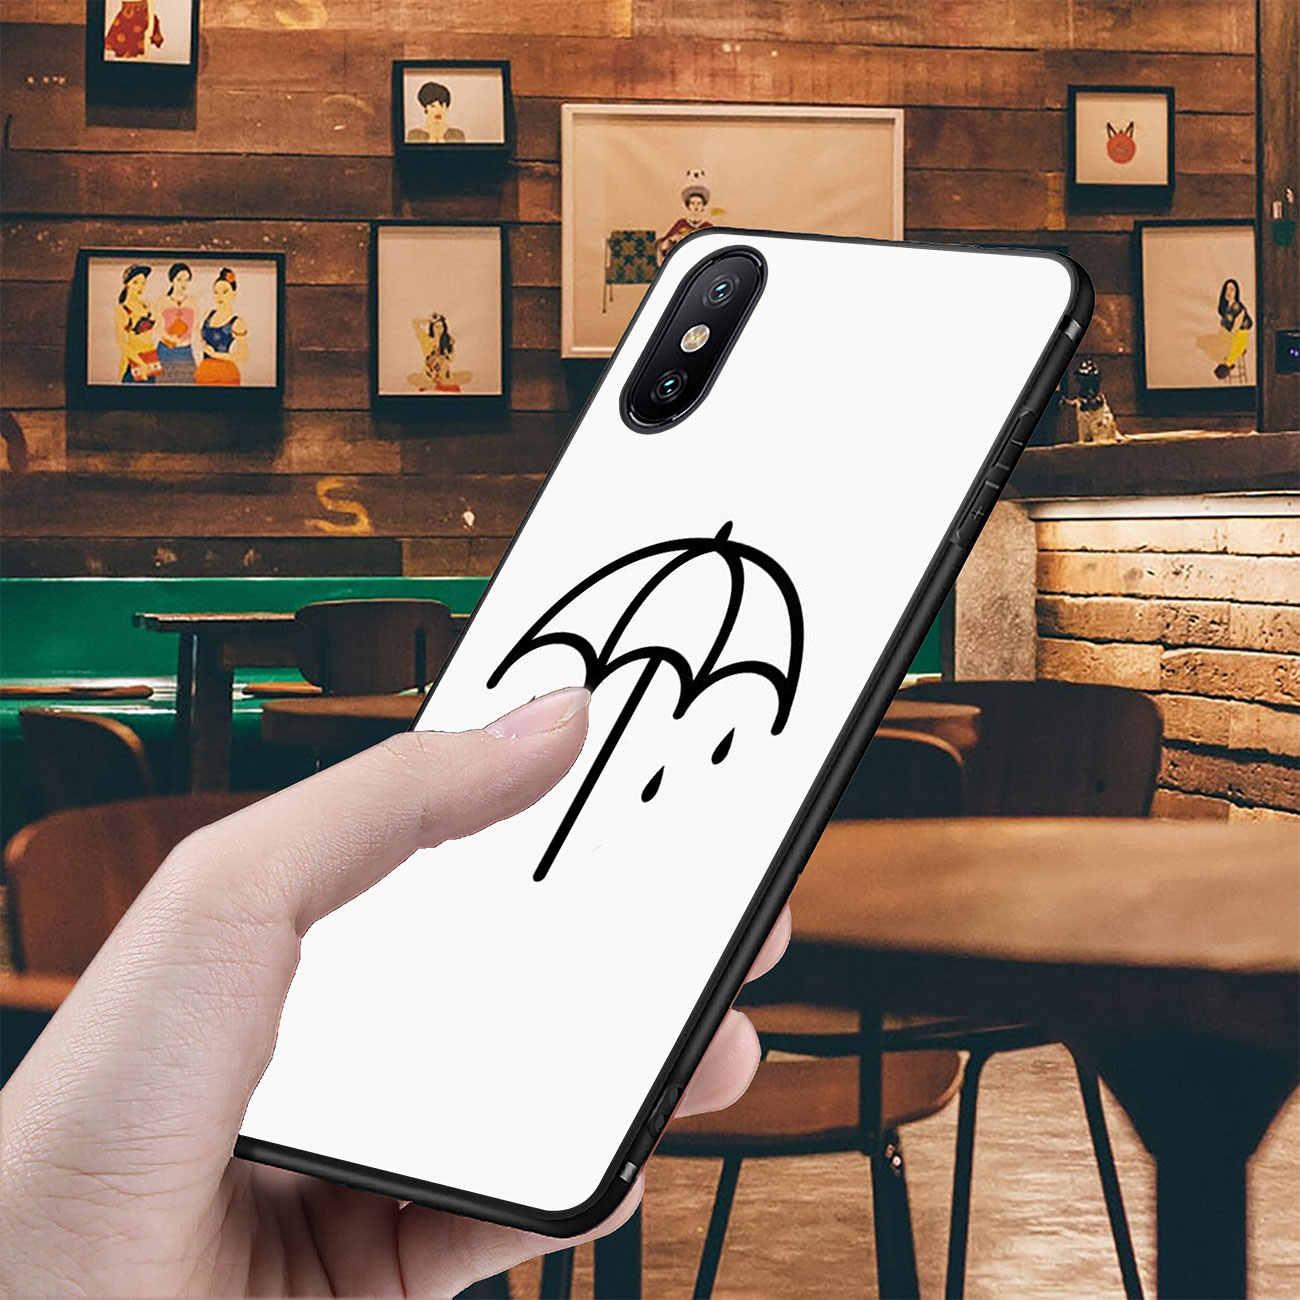 YIMAOC Oliver Sykes Me trae el horizonte bmth funda de silicona suave para iPhone 11 Pro XS Max XR X 6 6 6S 7 7 Plus 5 5S SE 10 flor